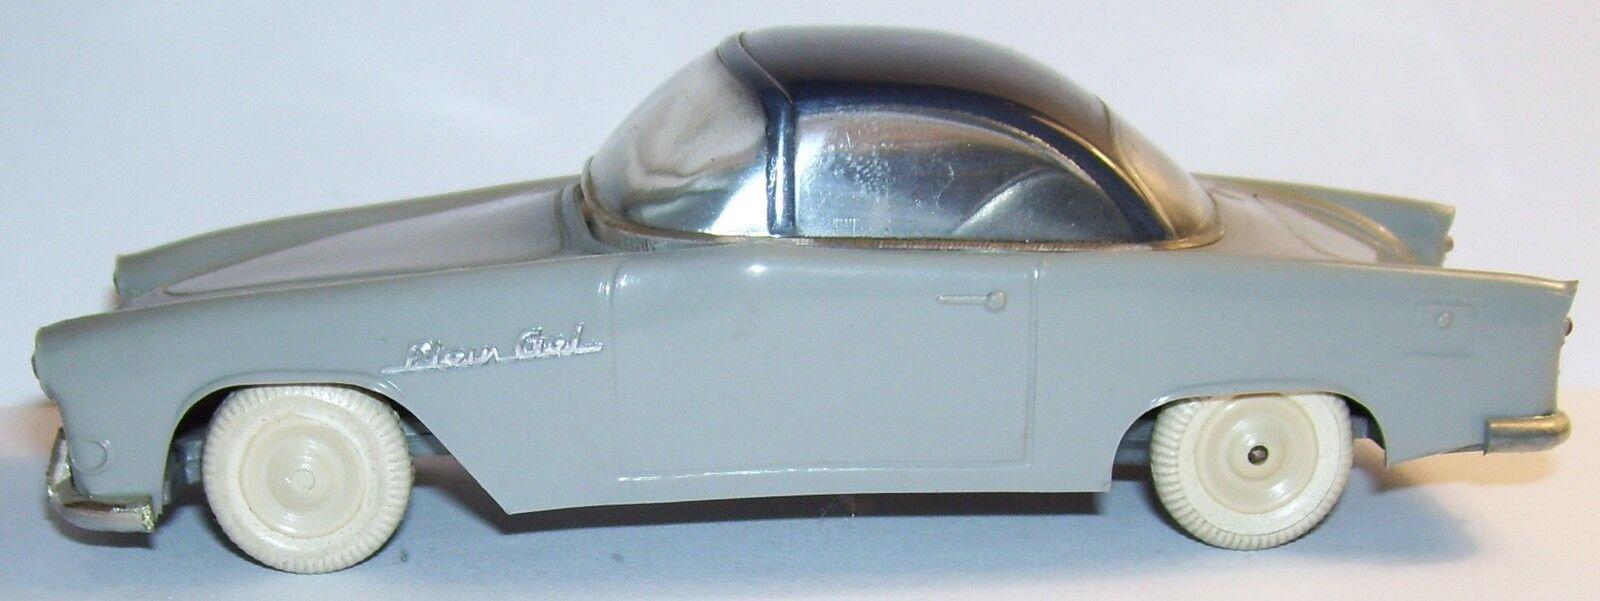 RARO OLD MINIALUXE SIMCA LLENO CIELO 1956 558 COUPE grigio TECHO nero FRICCIÓN 1